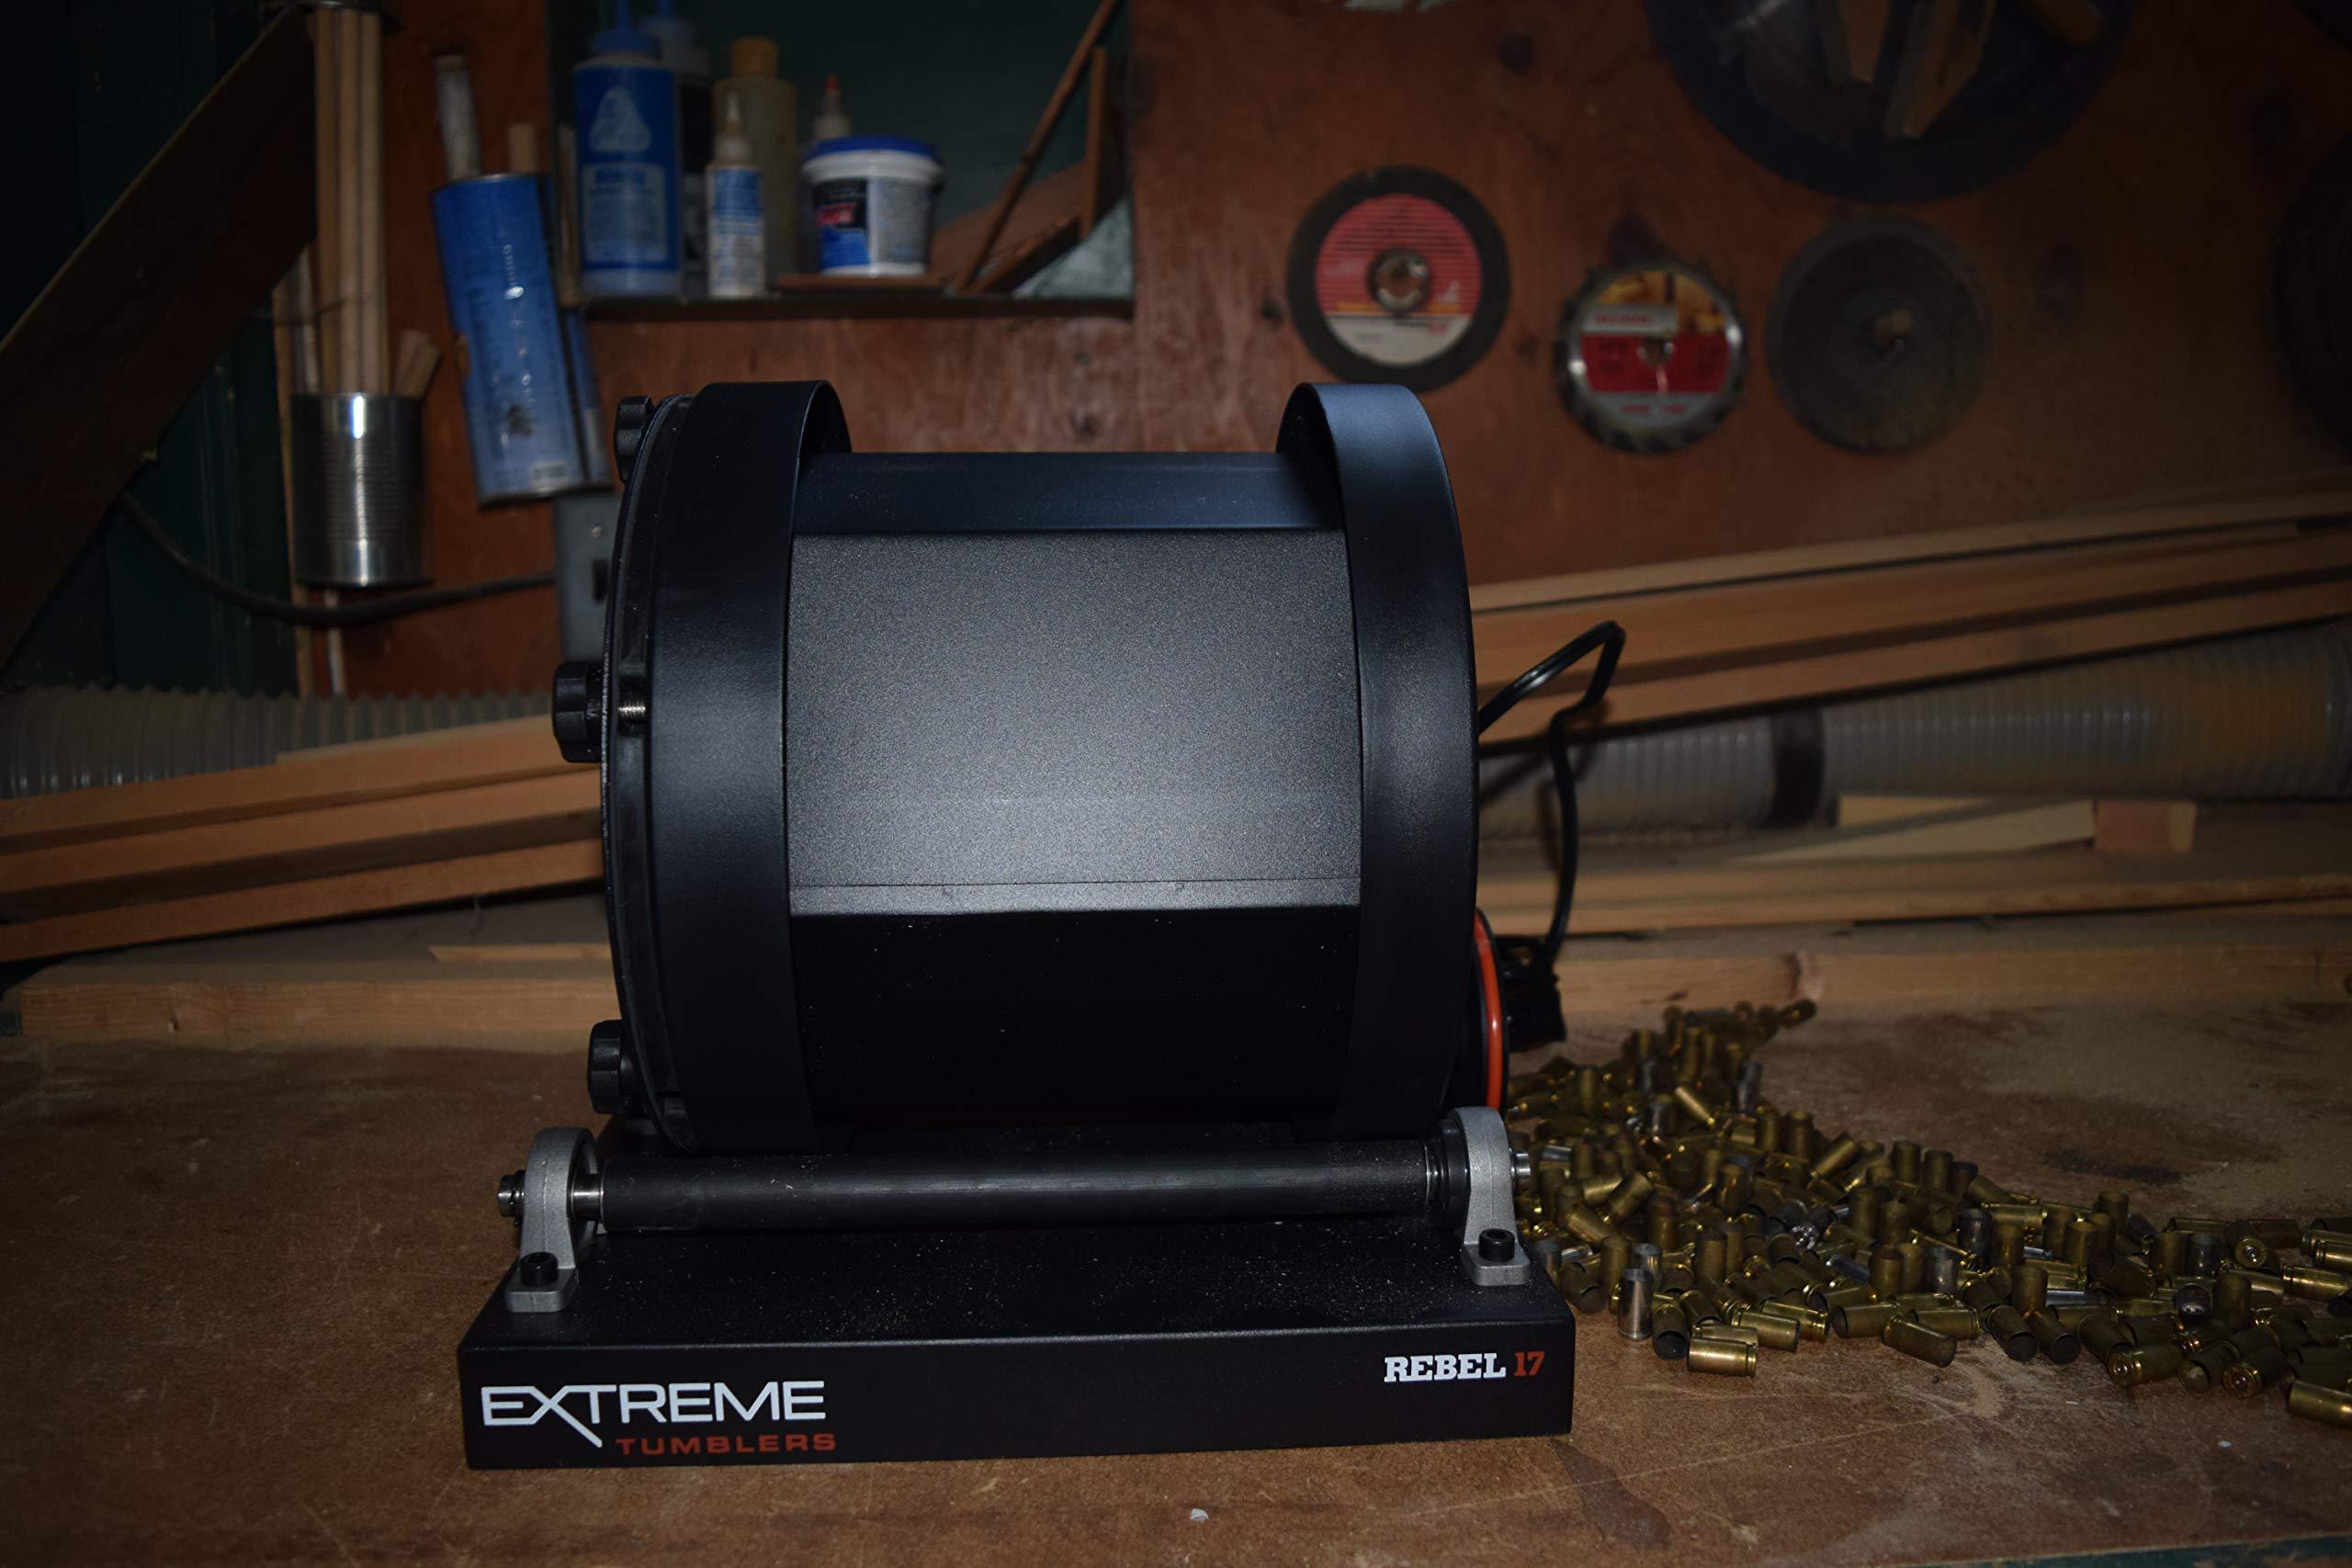 Extreme Tumblers Stainless Steel Deluxe Ammo Reloading Kit Rebel 17 Tumbler - Media Separator - Stainless Steel Media - Detergent by Extreme Tumblers (Image #4)